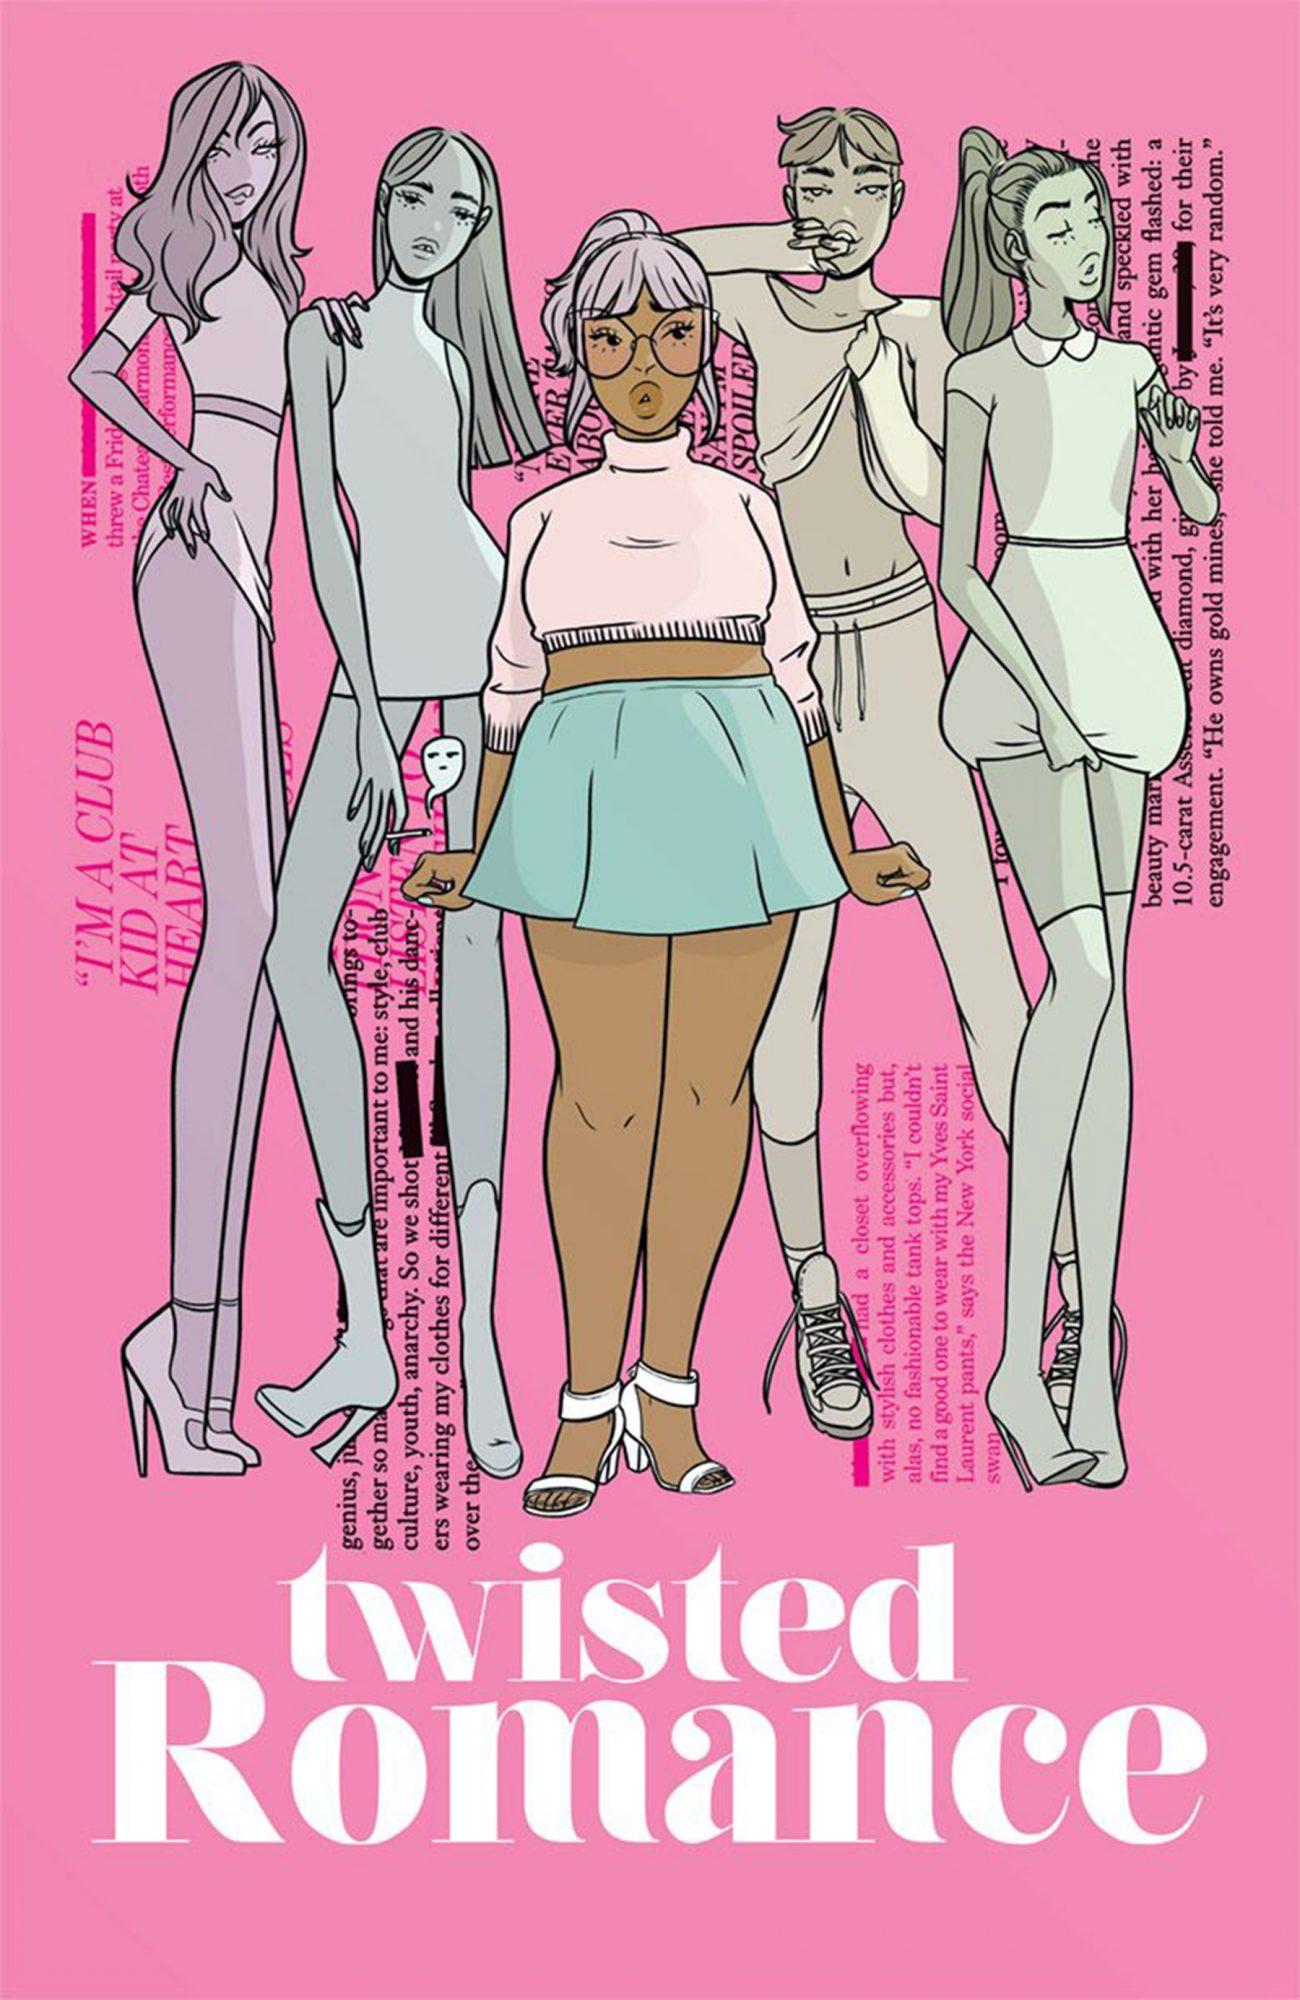 Twisted RomanceCredit: Image Comics